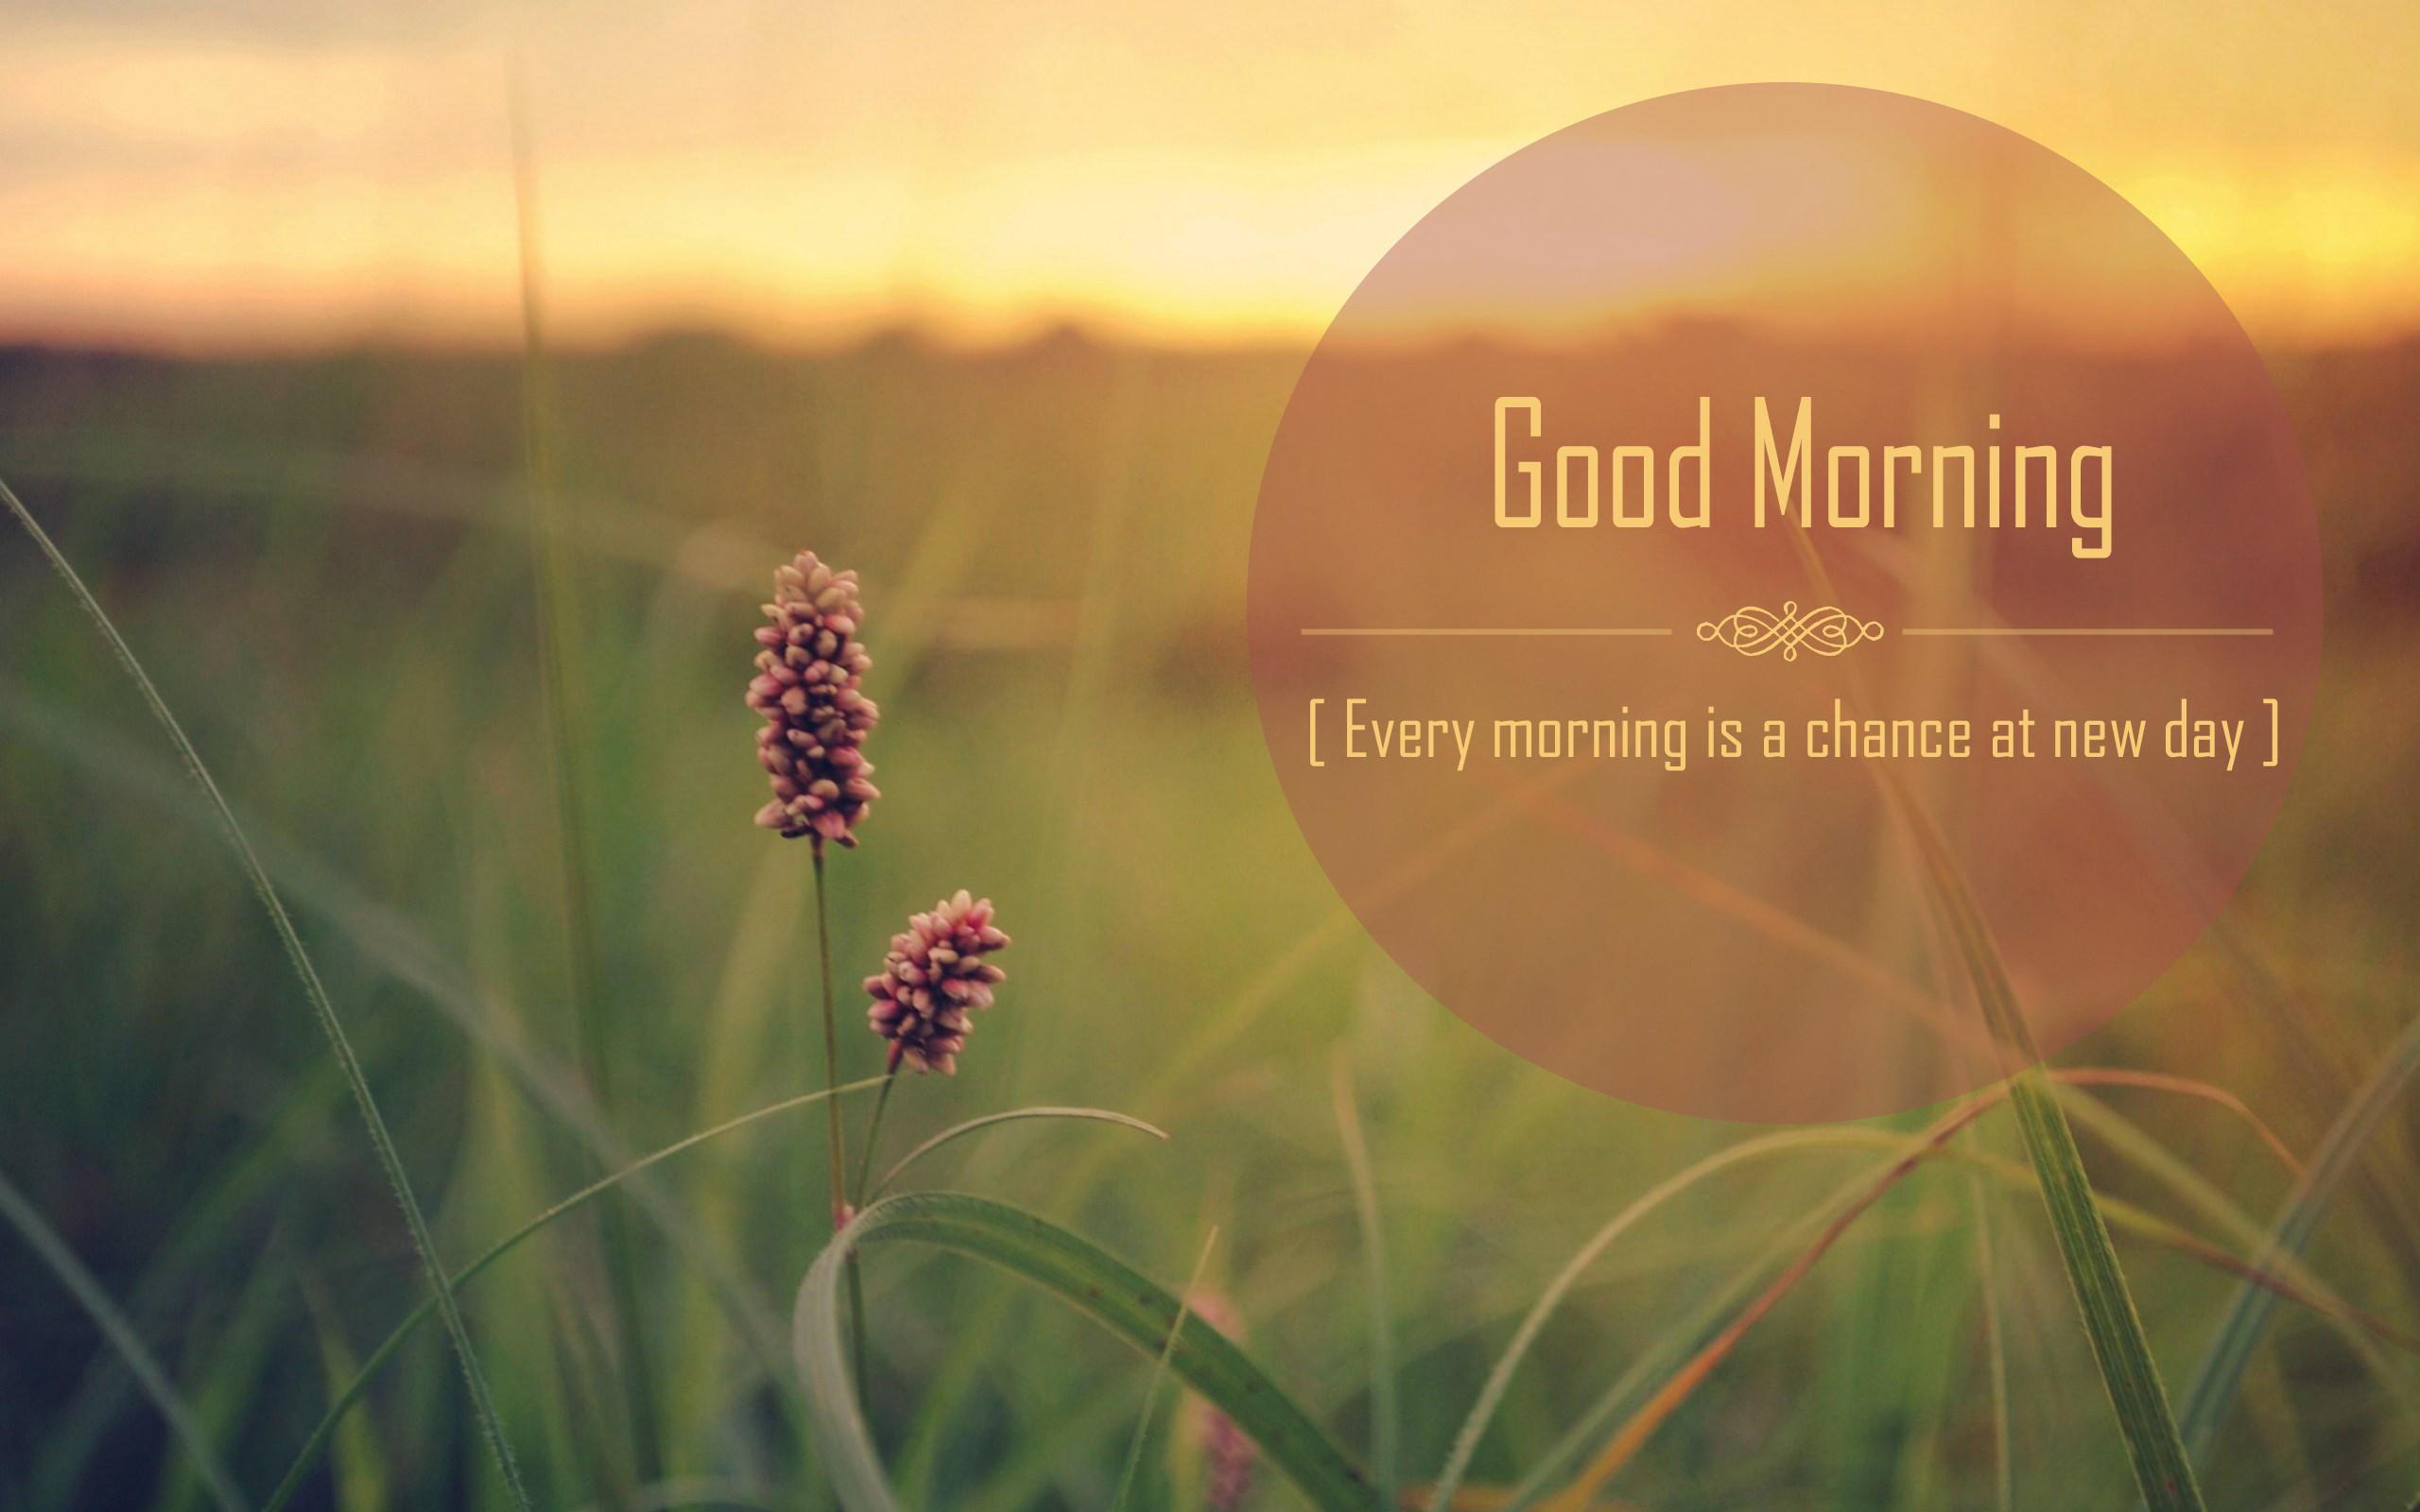 good-morning-quotes-Beautiful-Good-Morning-Quotes-picspaper-com